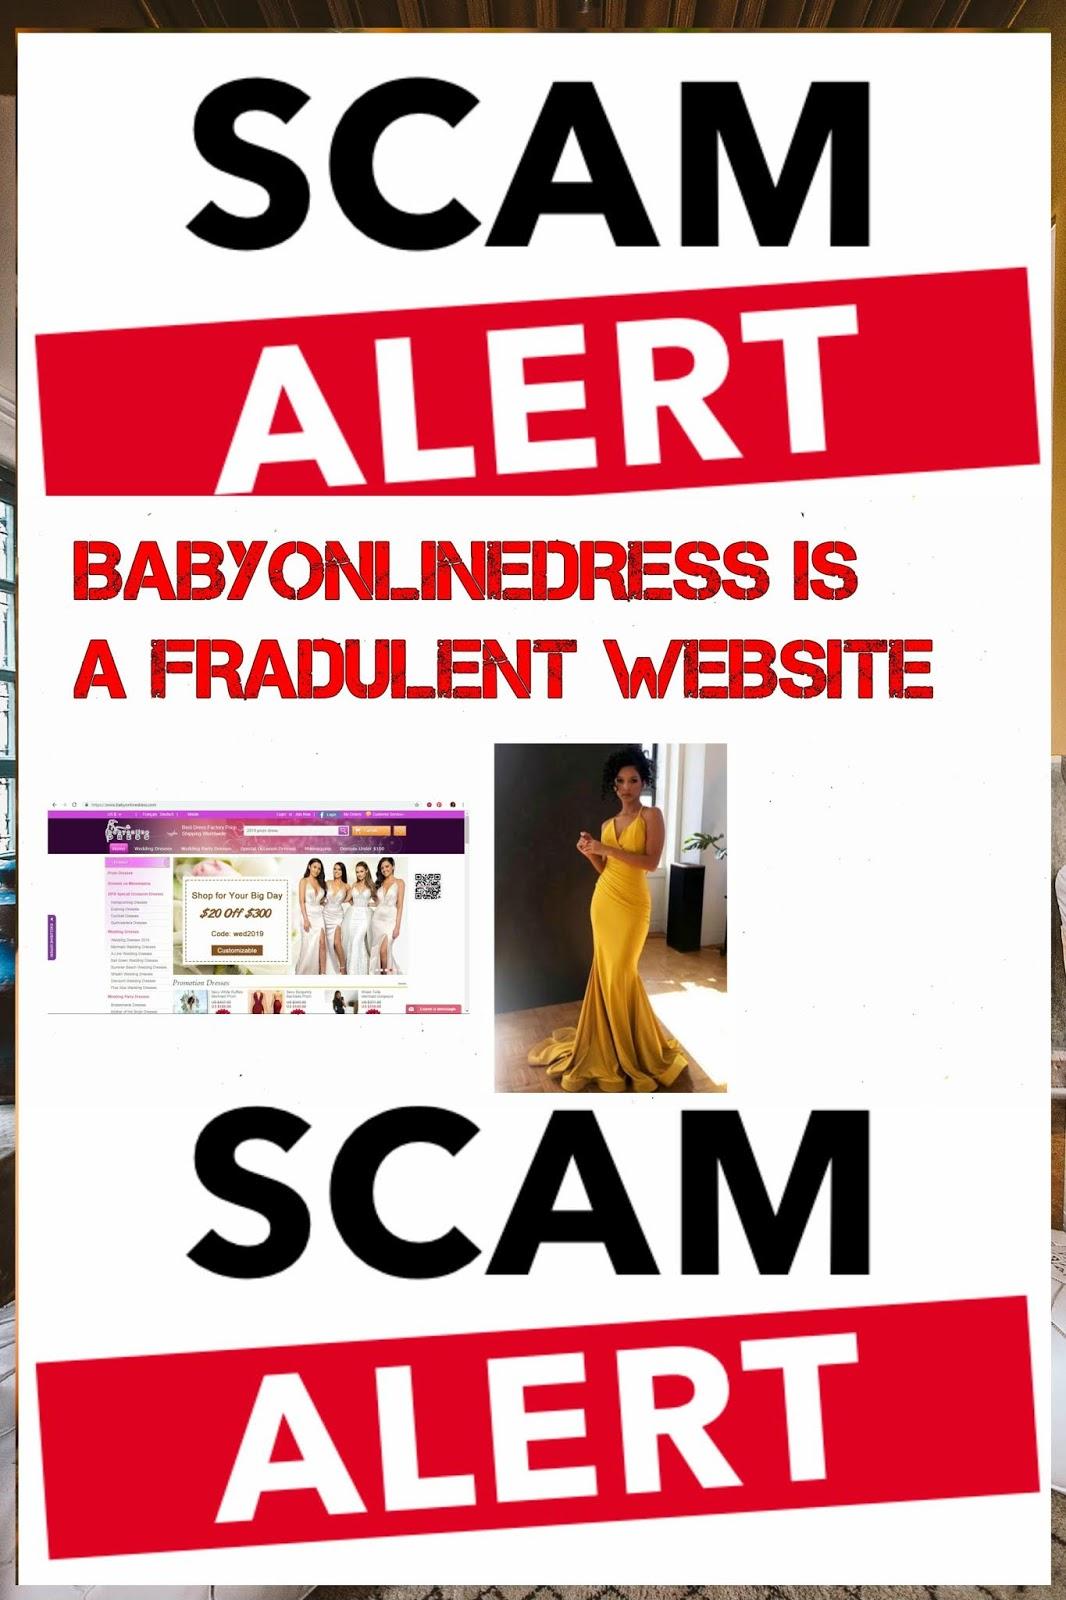 Babyonlinedress Com Is A Fraudulent Website Bloggers Stop Writing False Reviews For Them Mélòdý Jacòb